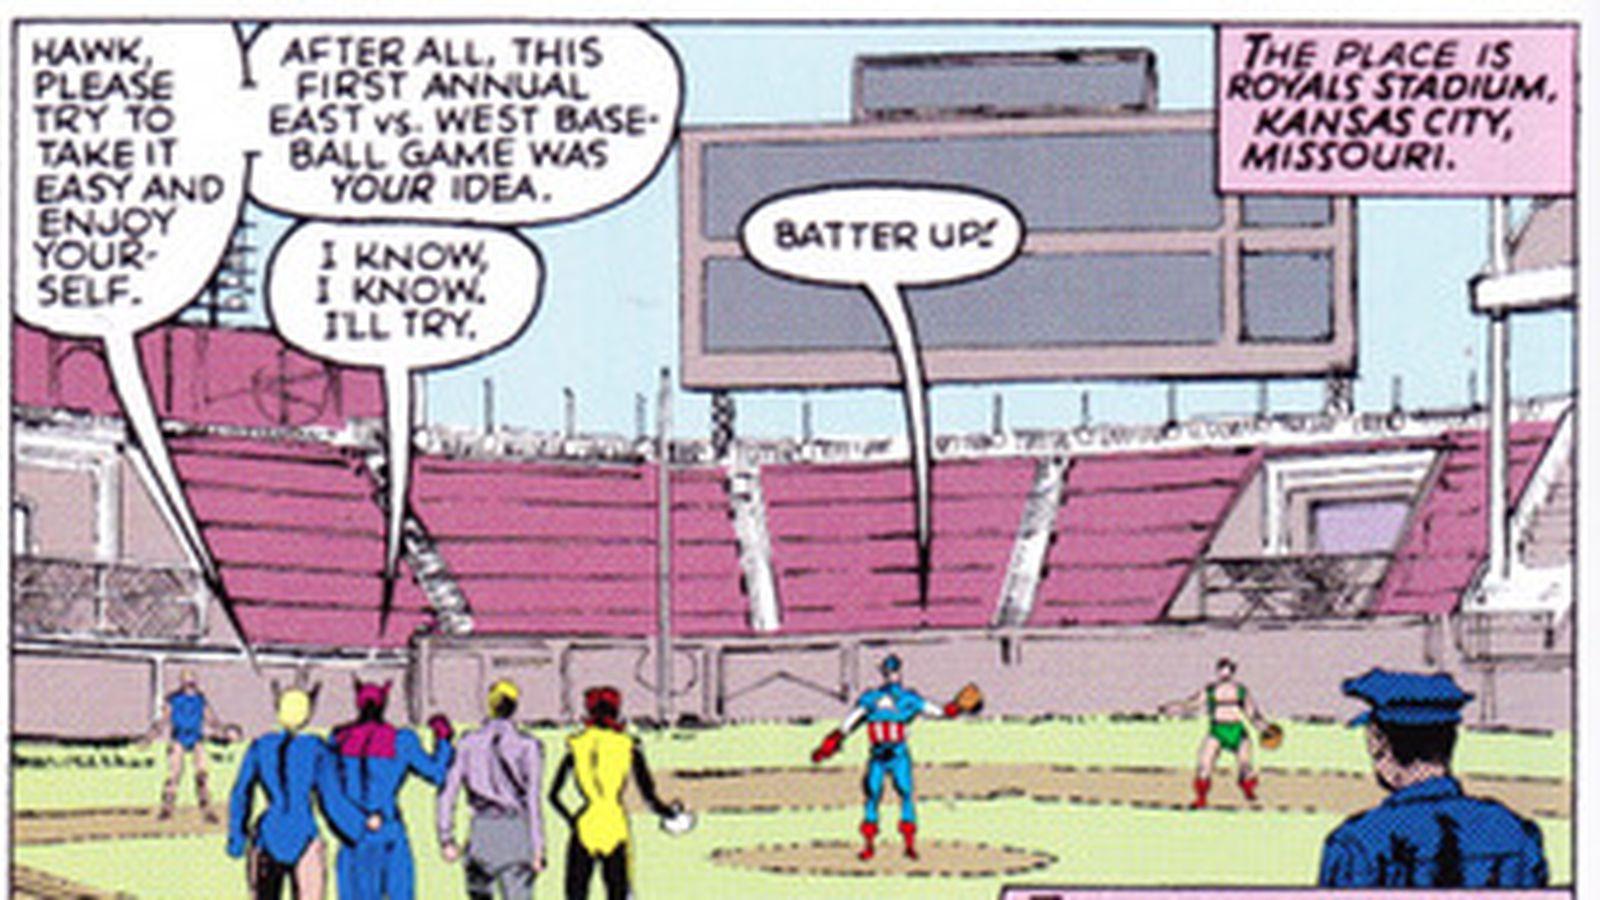 Keller S Ics Corner Royals Stadium Hosts The Avengers